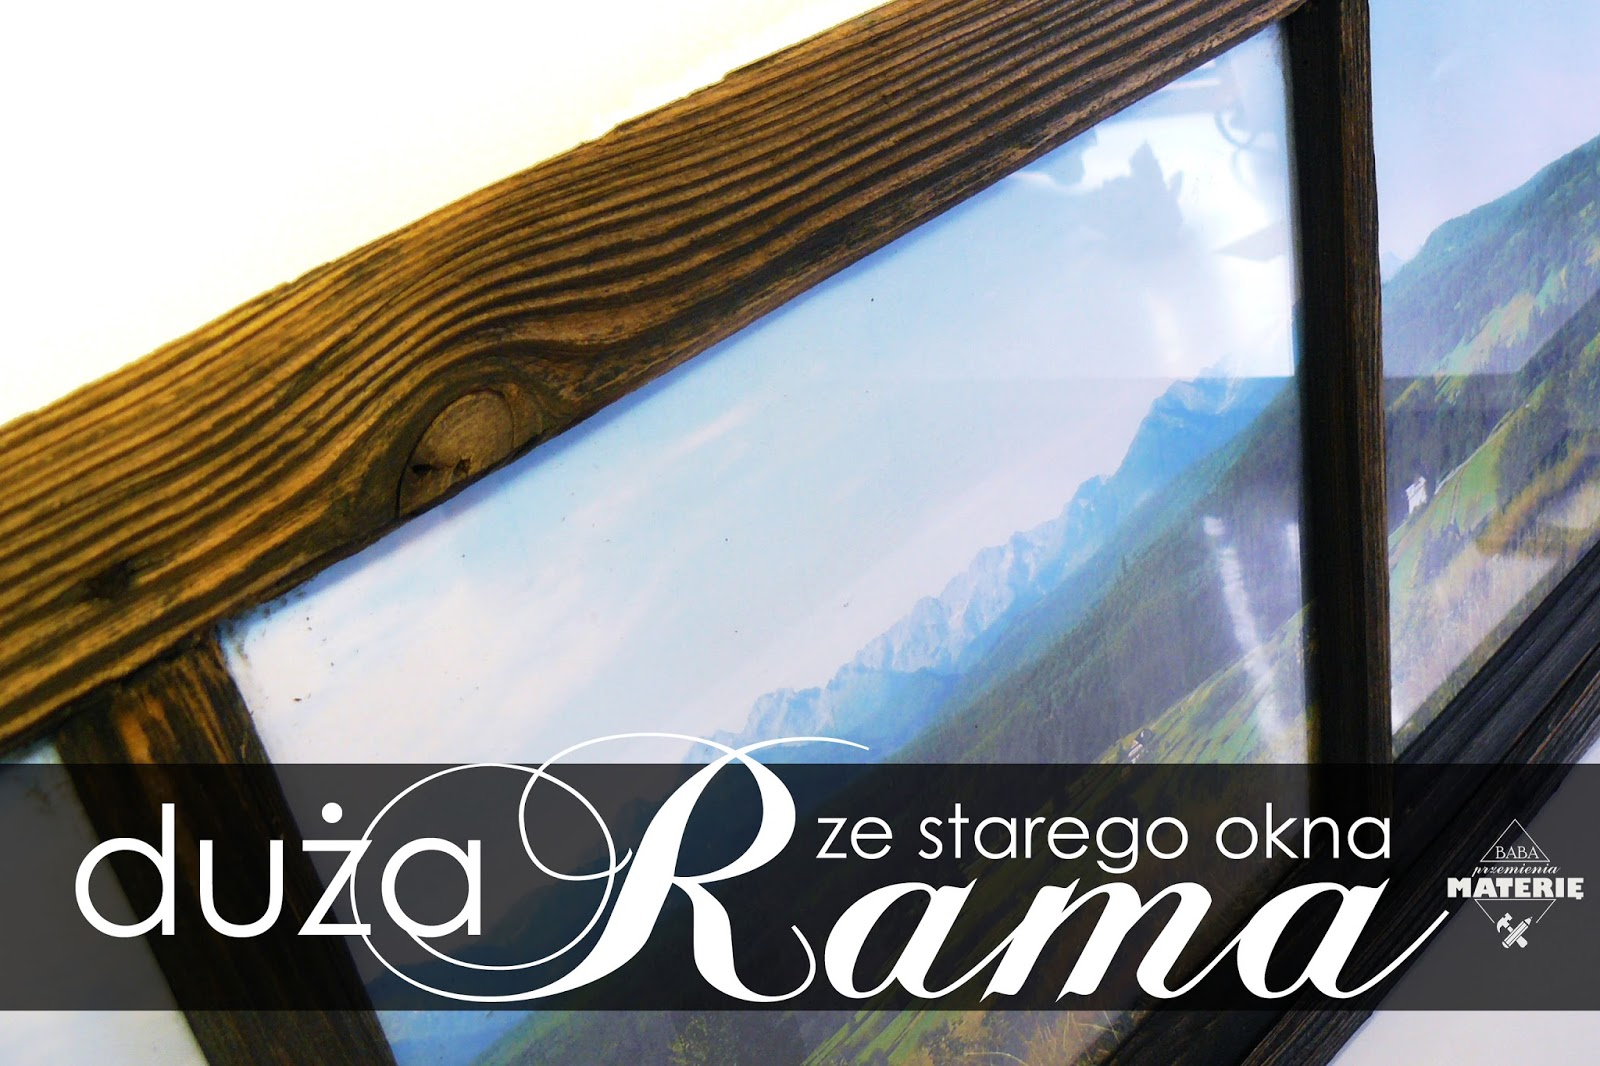 http://babaprzemieniamaterie.blogspot.com/2016/08/duza-rama-na-zdjecia-ze-starego-okna.html#more